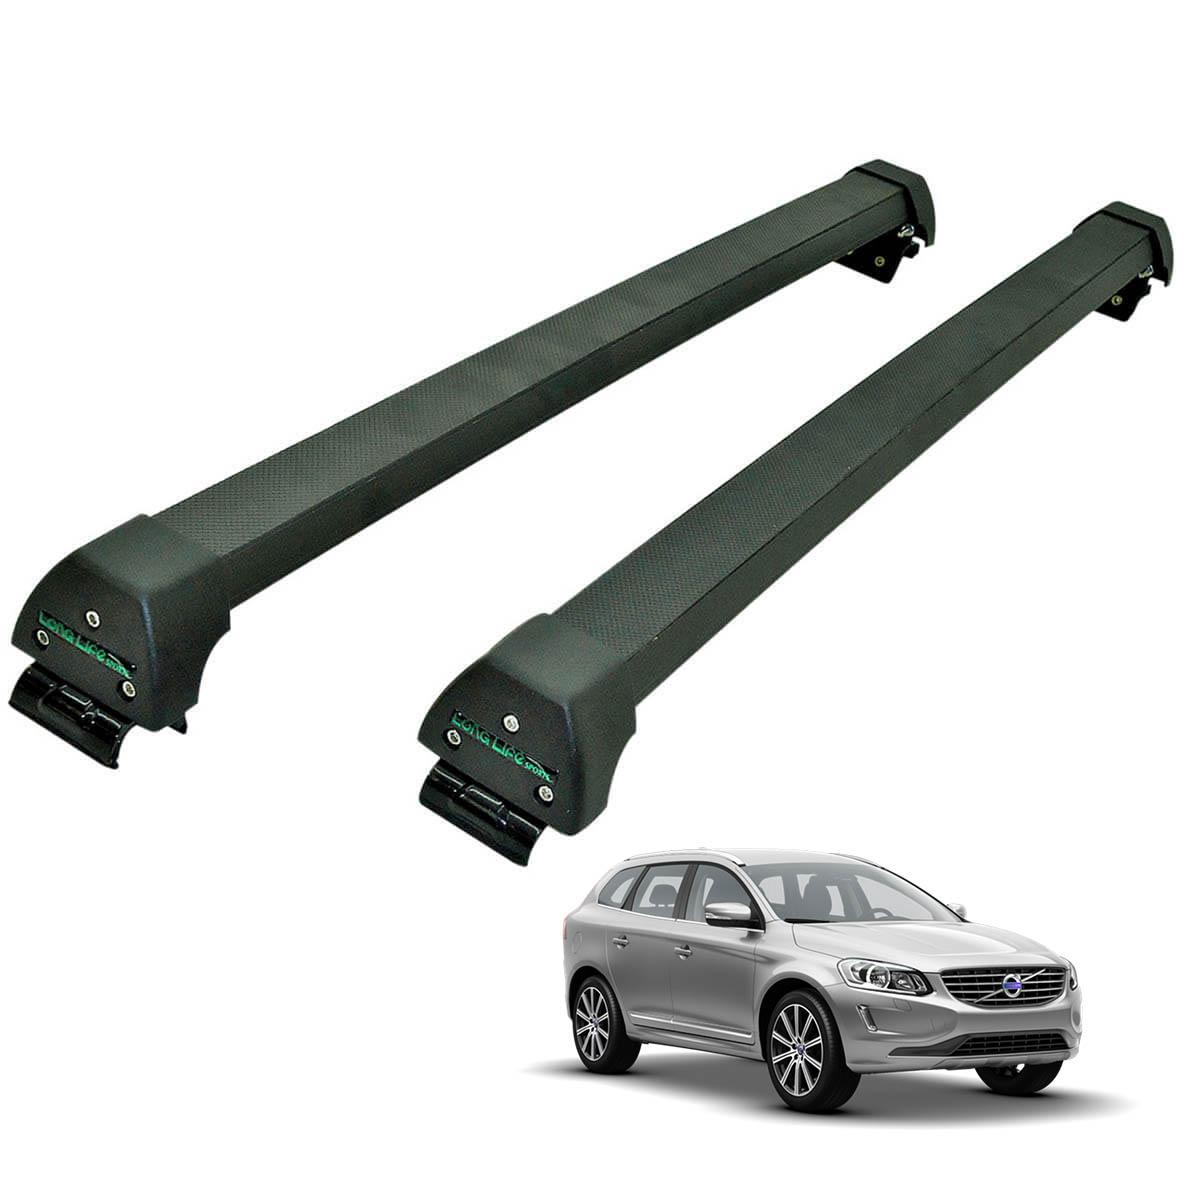 Rack de teto Volvo XC60 2009 a 2016 Long Life Sports preto